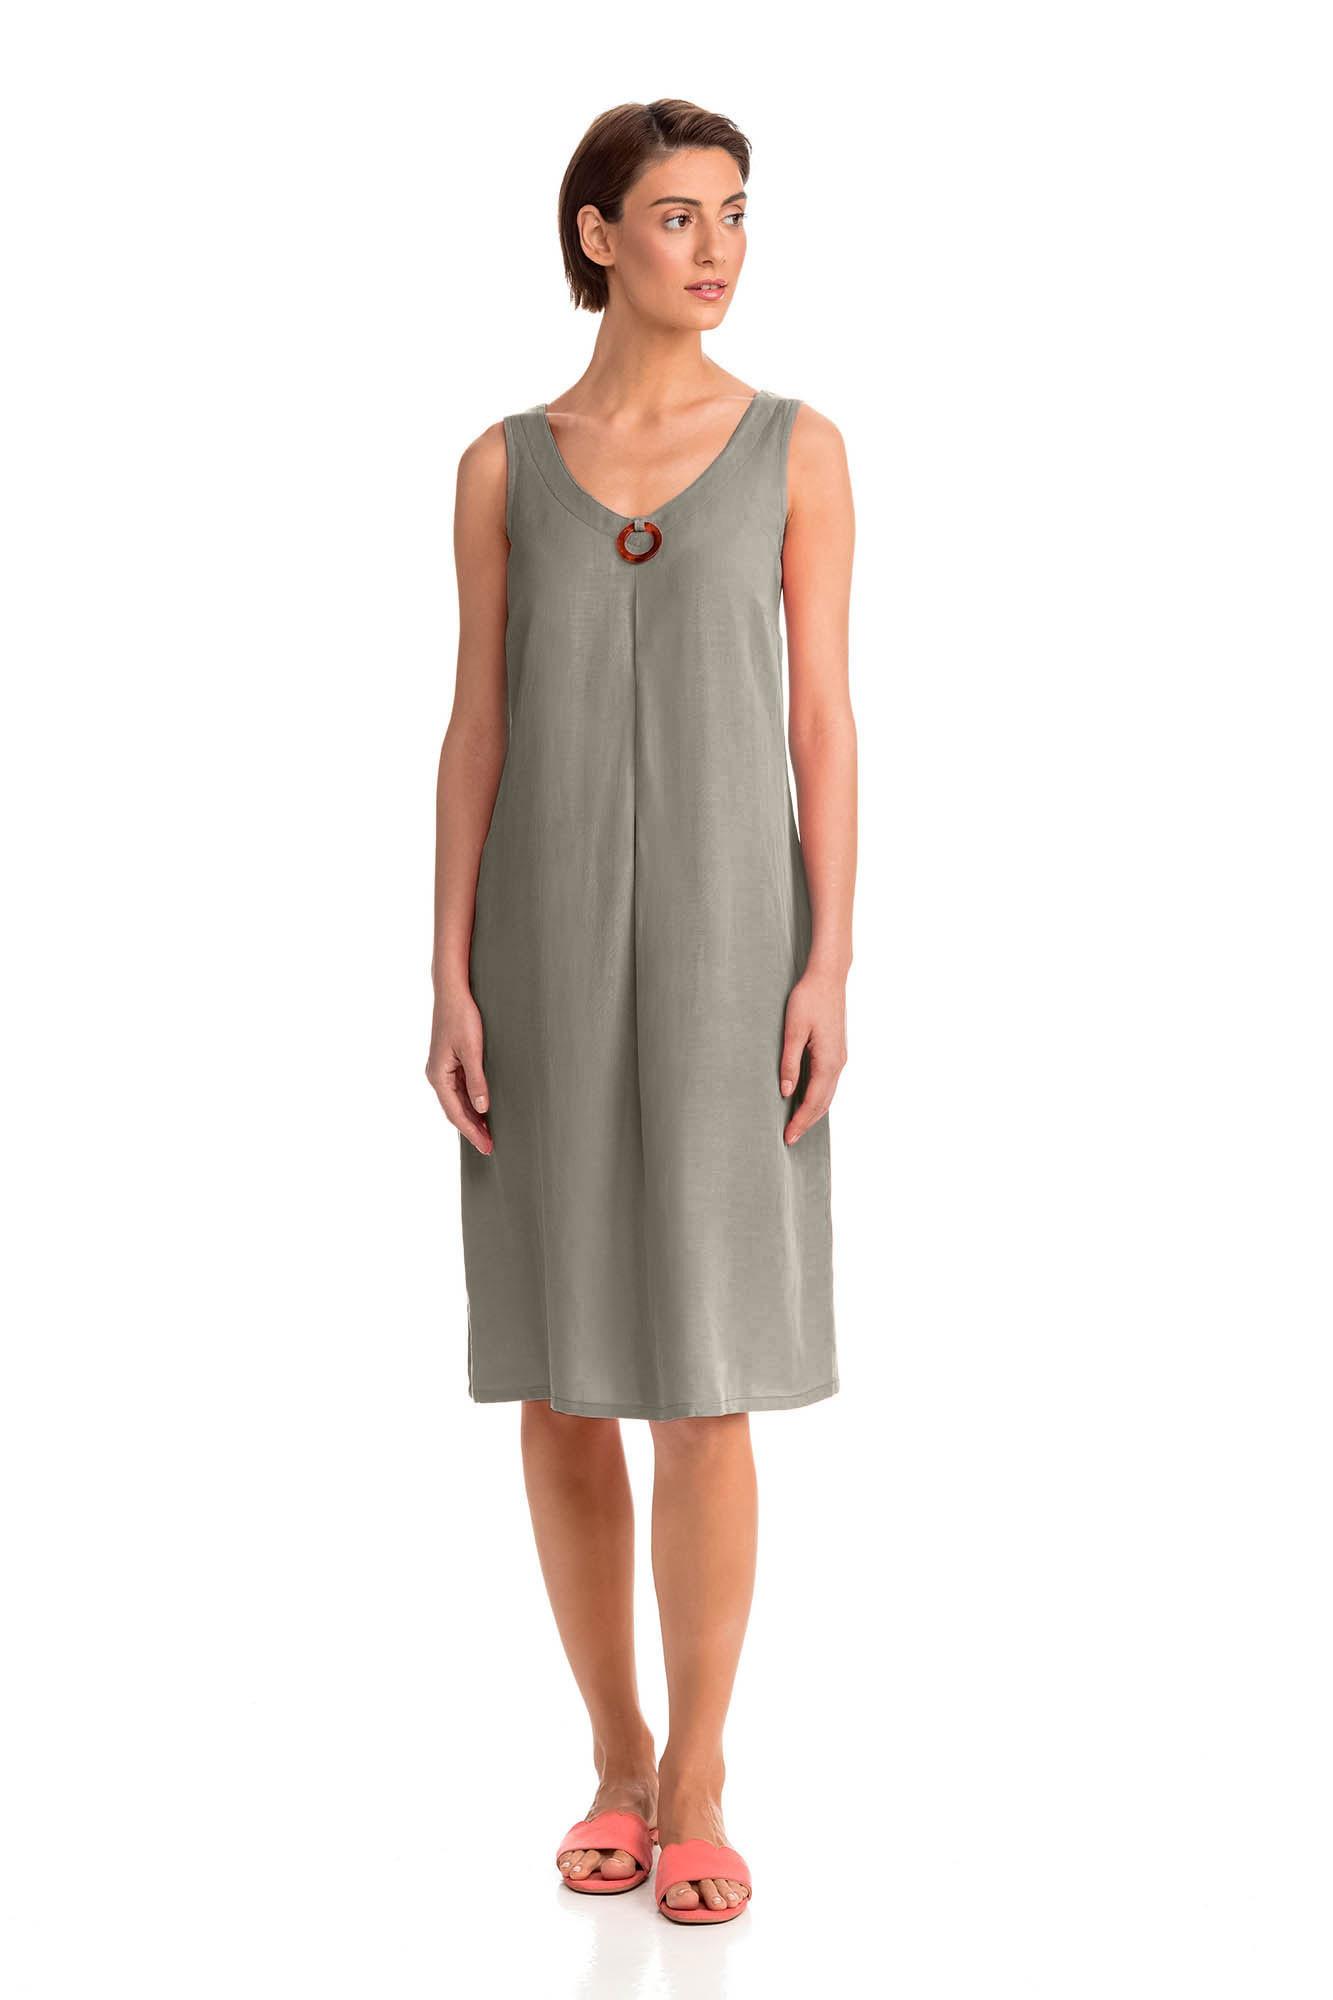 Vamp - Letné dámske šaty 14443 - Vamp green sage s